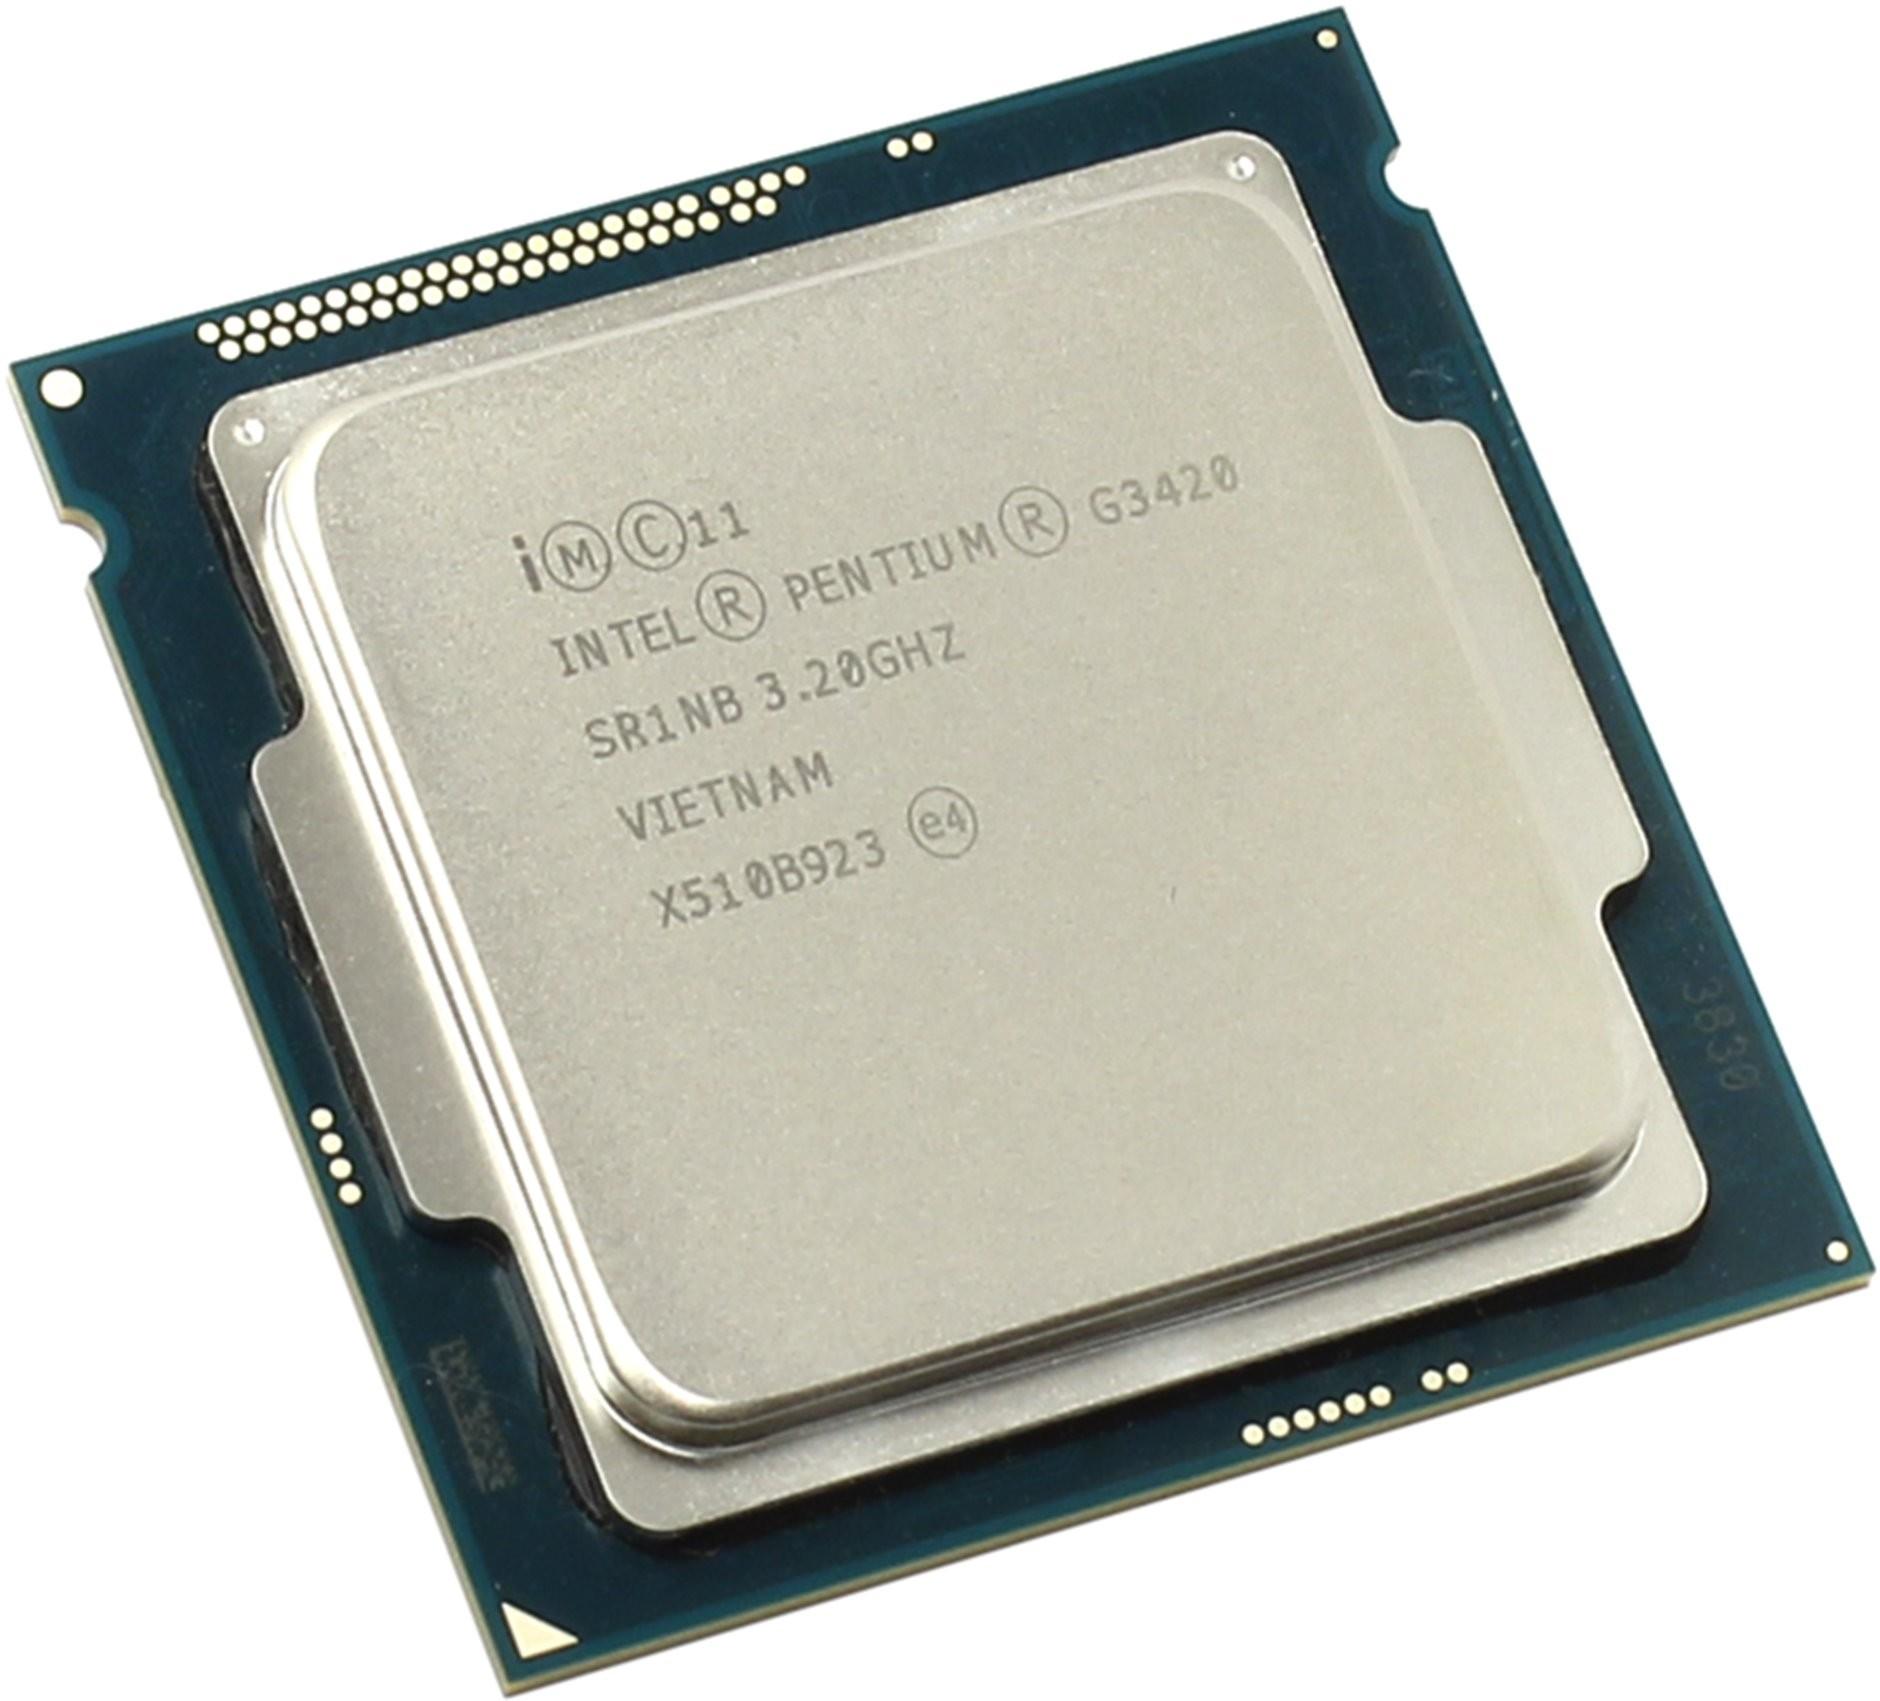 Bundle Asrock H81 Pro BTC+ + CPU Intel G3420 - d1a8970d44908da4ba86c507b6dd79ba.jpg